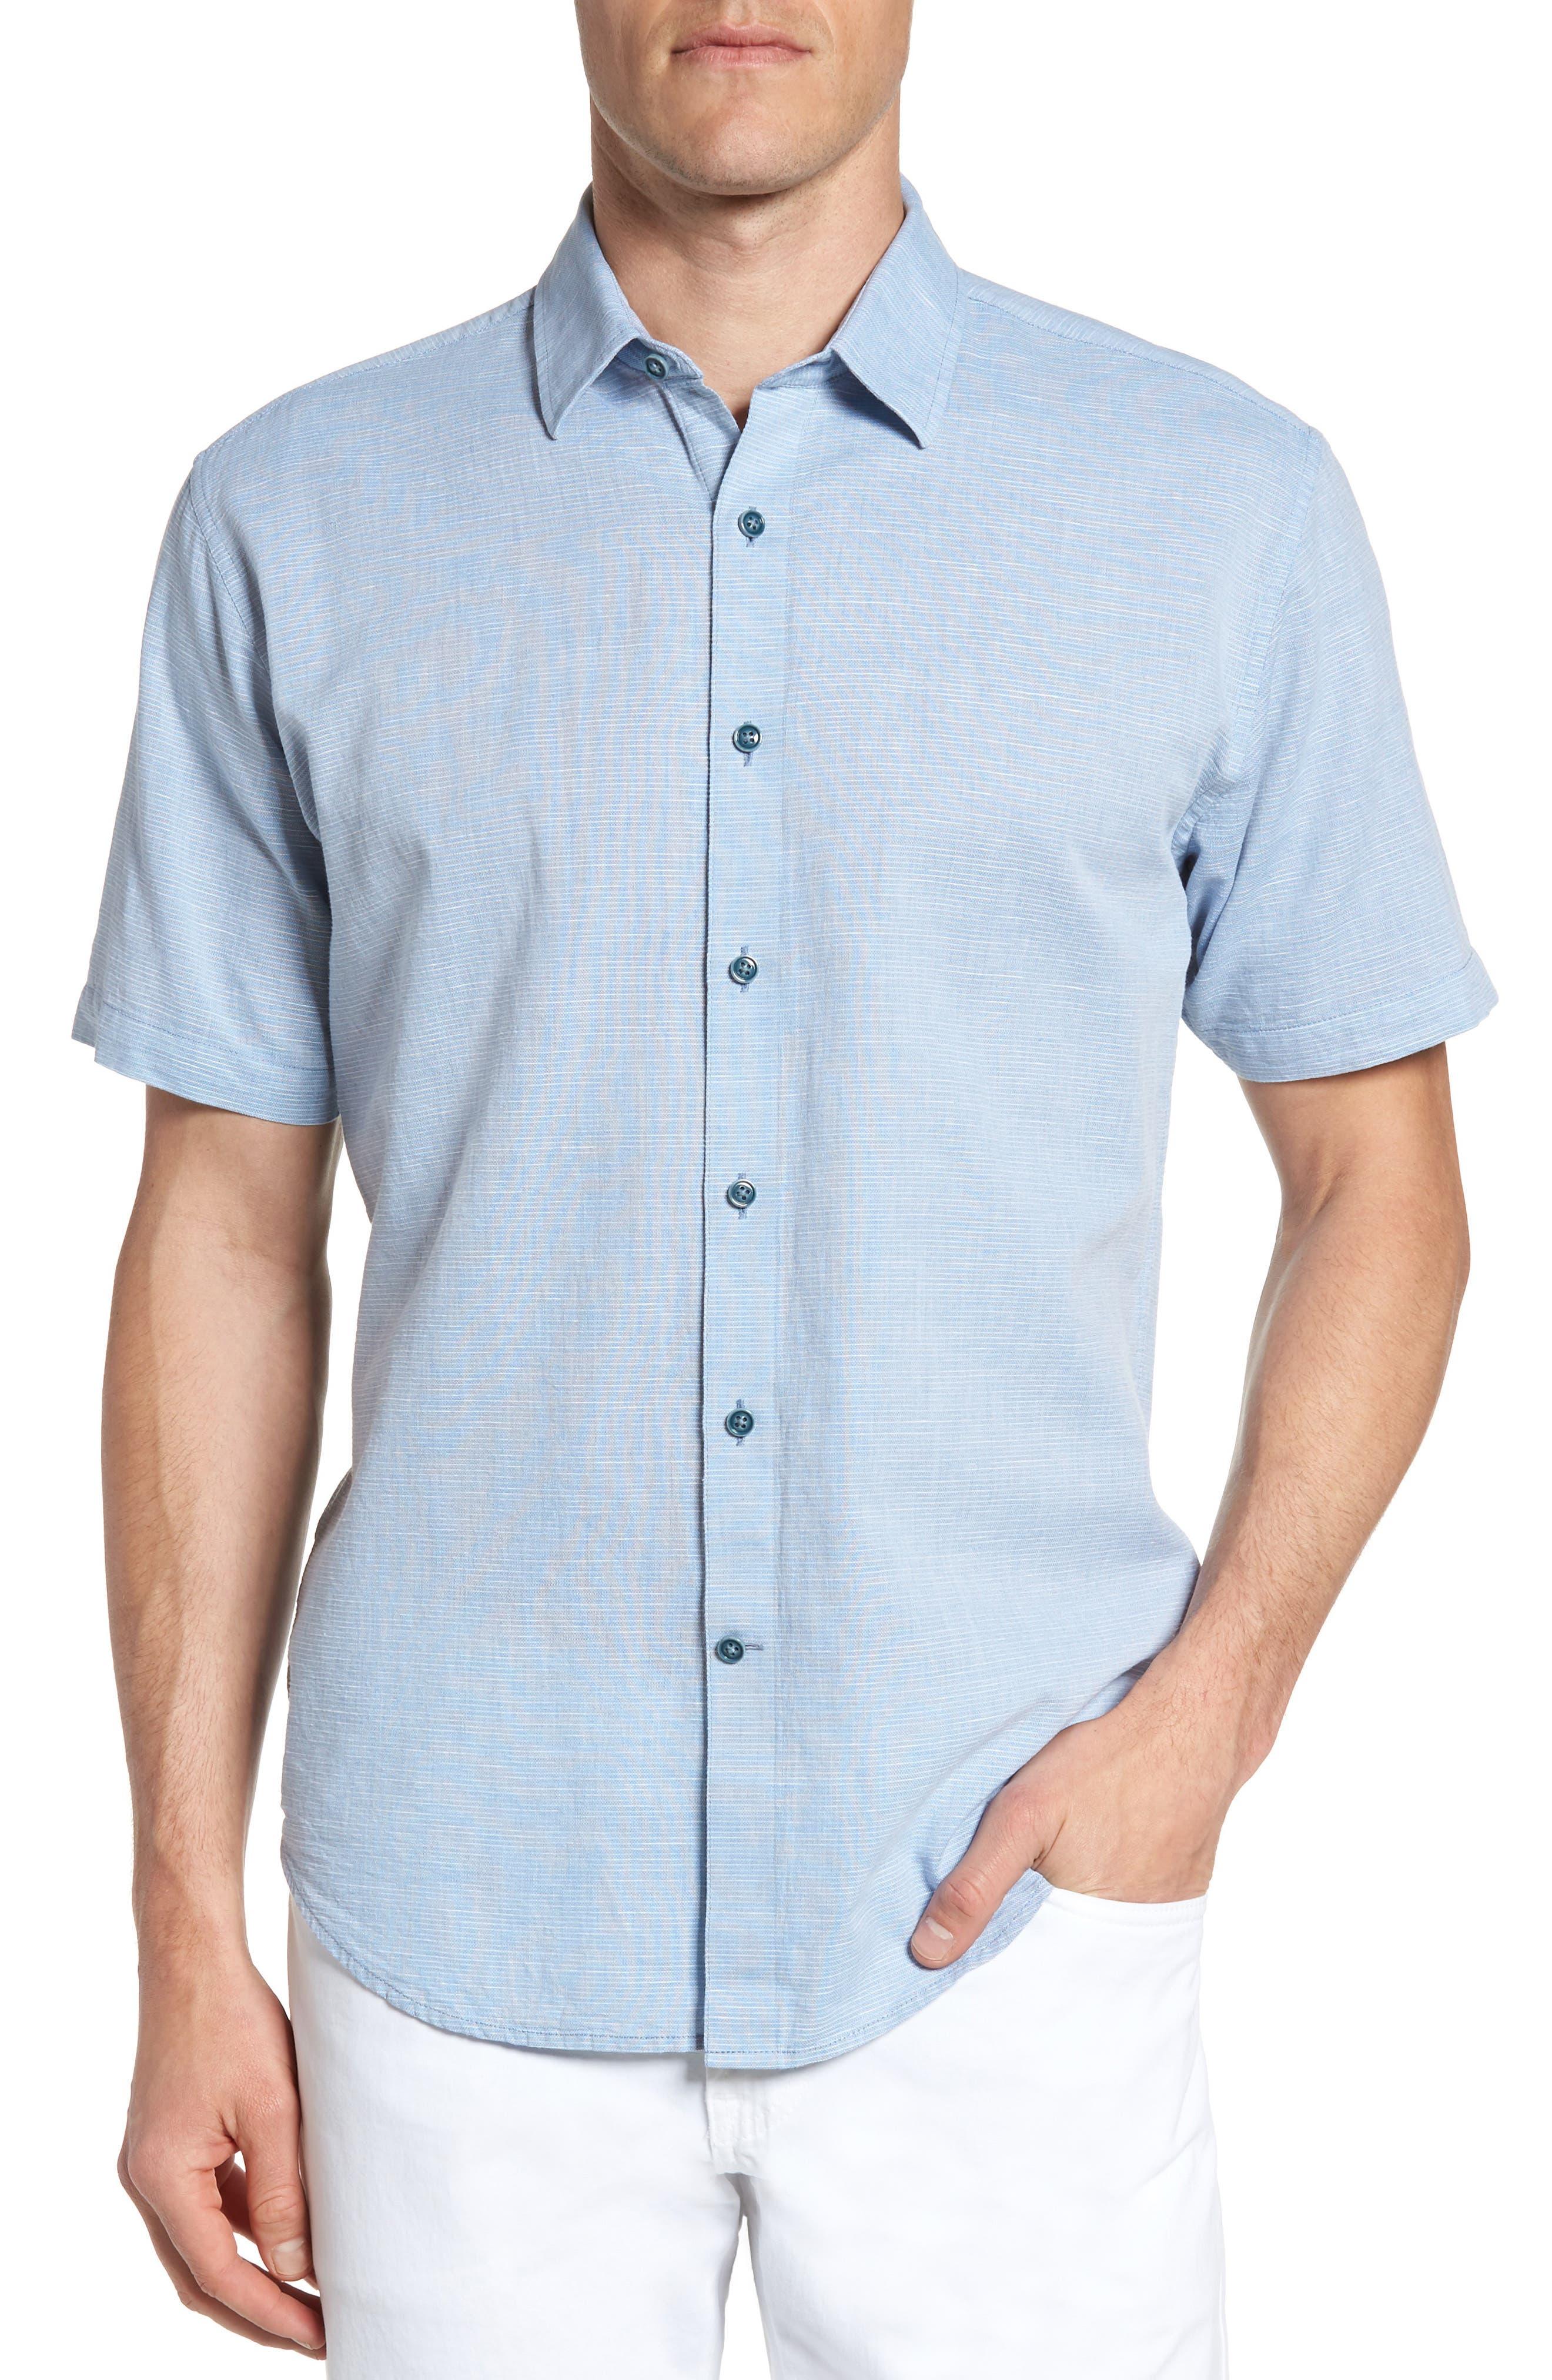 Main Image - James Campbell 'Ellerbe' Regular Fit Short Sleeve Sport Shirt